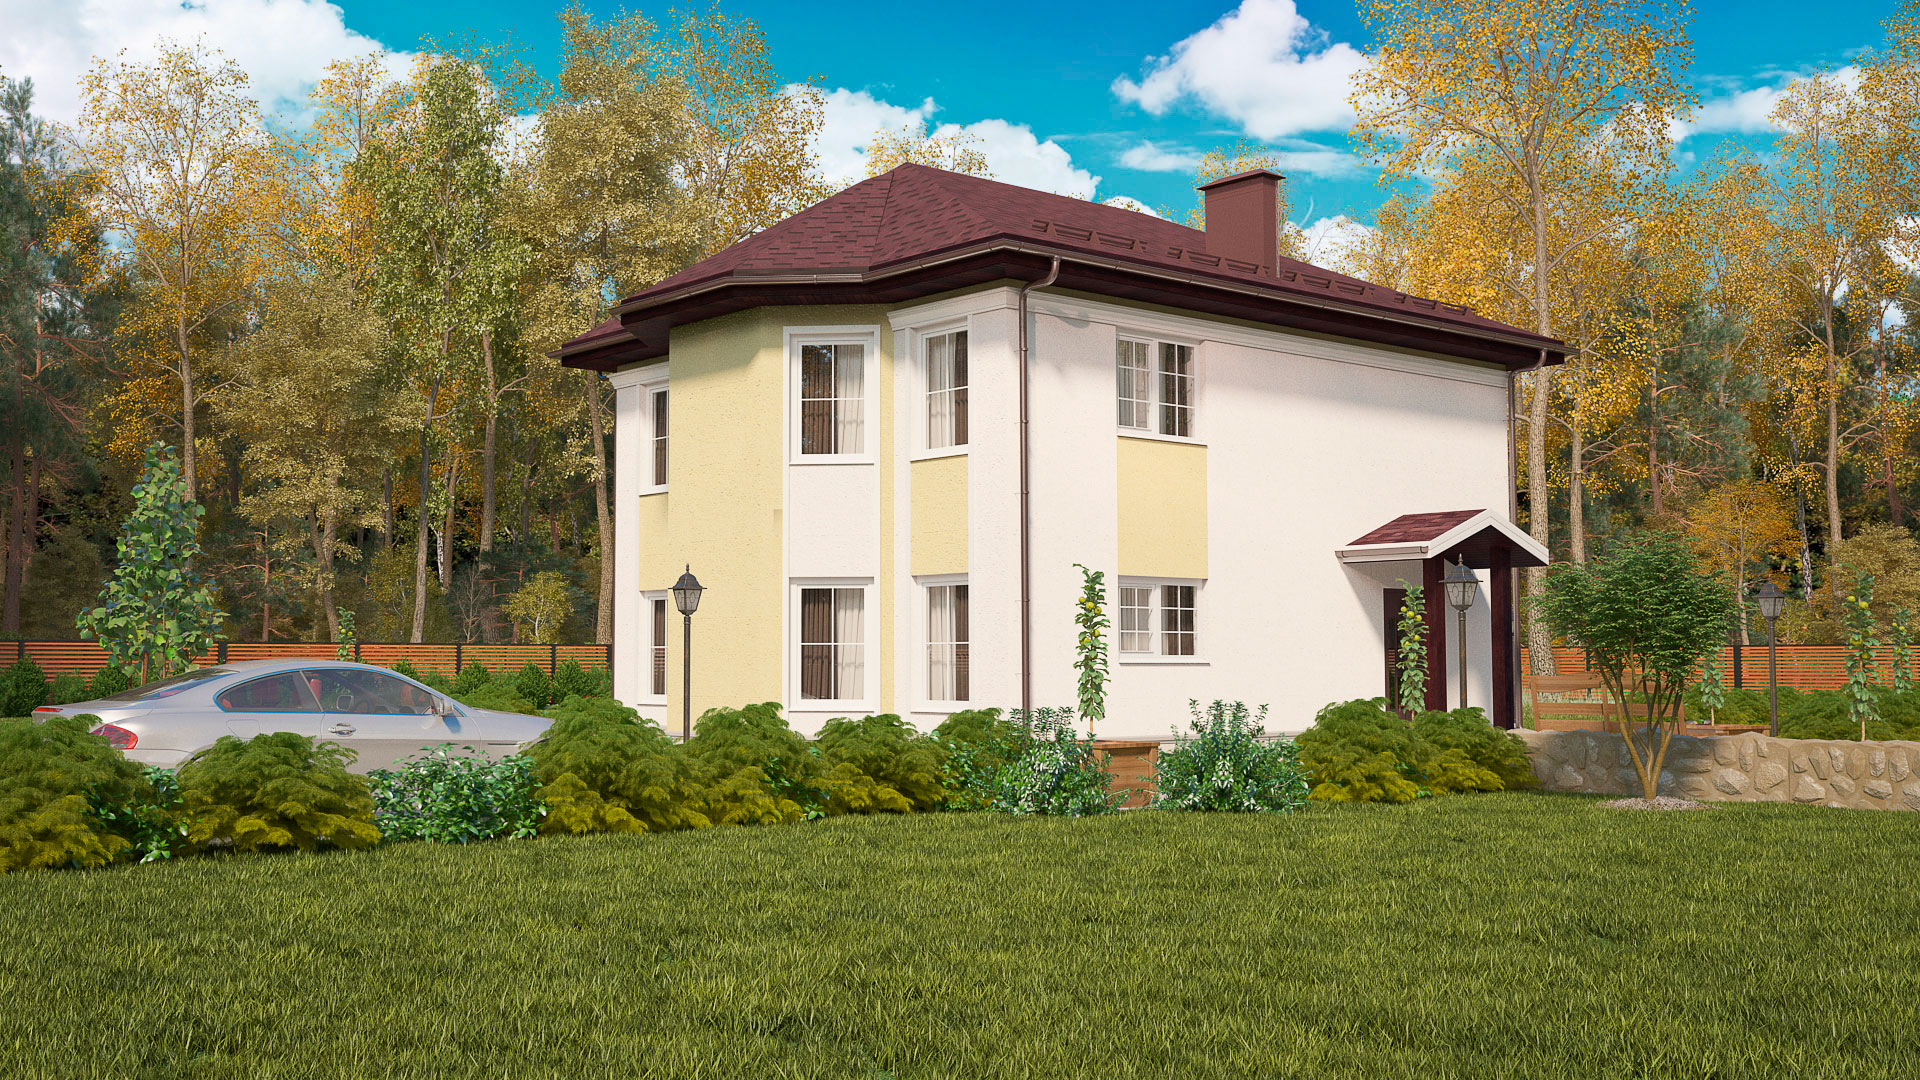 Передний фасад двухэтажного дома с камином и эркером, проект БЭНПАН МС-143.